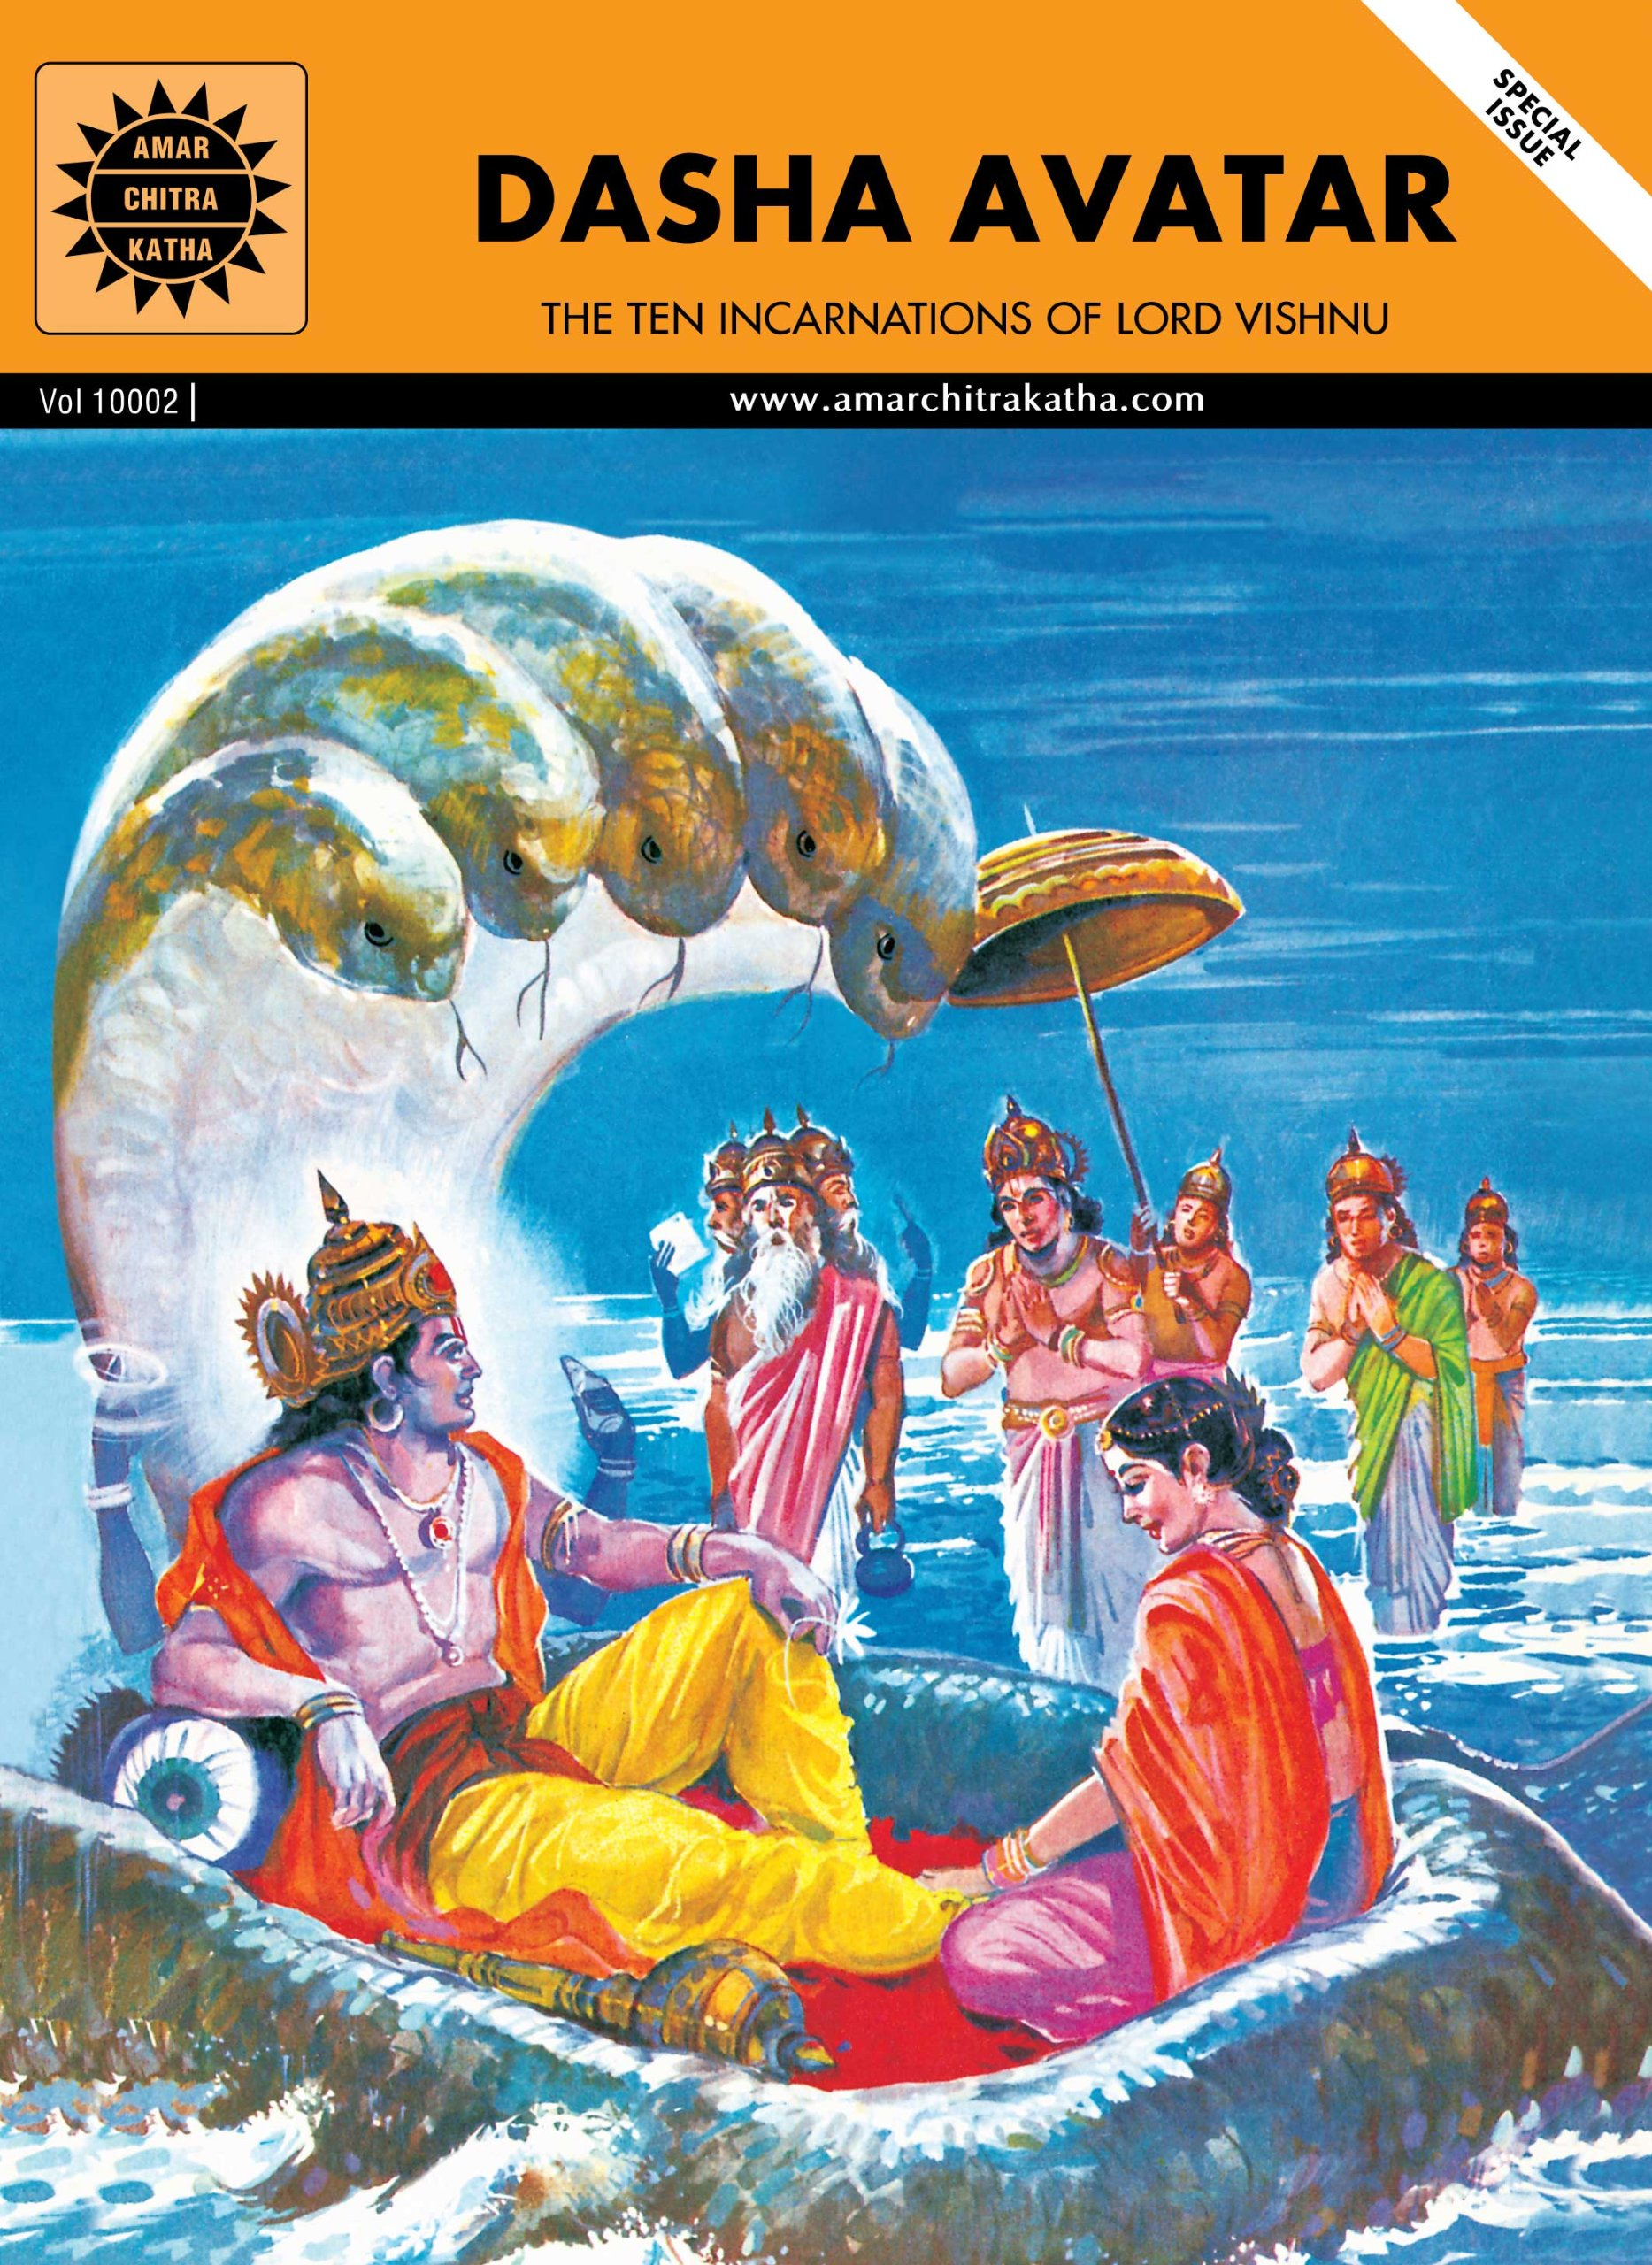 Dasha Avatar: The Ten Incarnations of Lord Vishnu (Amar Chitra Katha